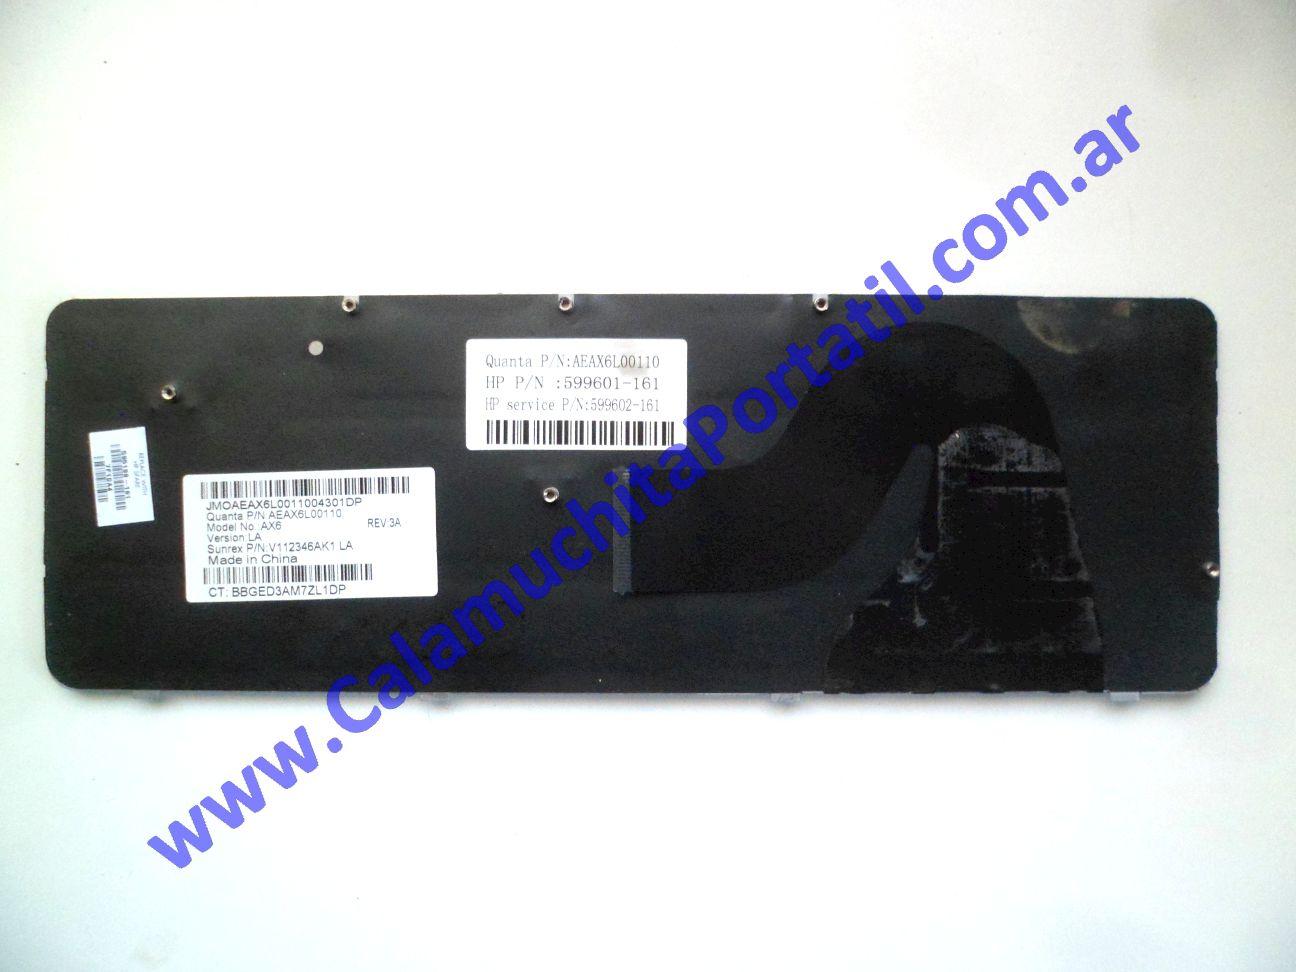 0611KBA Teclado Compaq Presario CQ56-106LA / XR161LA#AC8